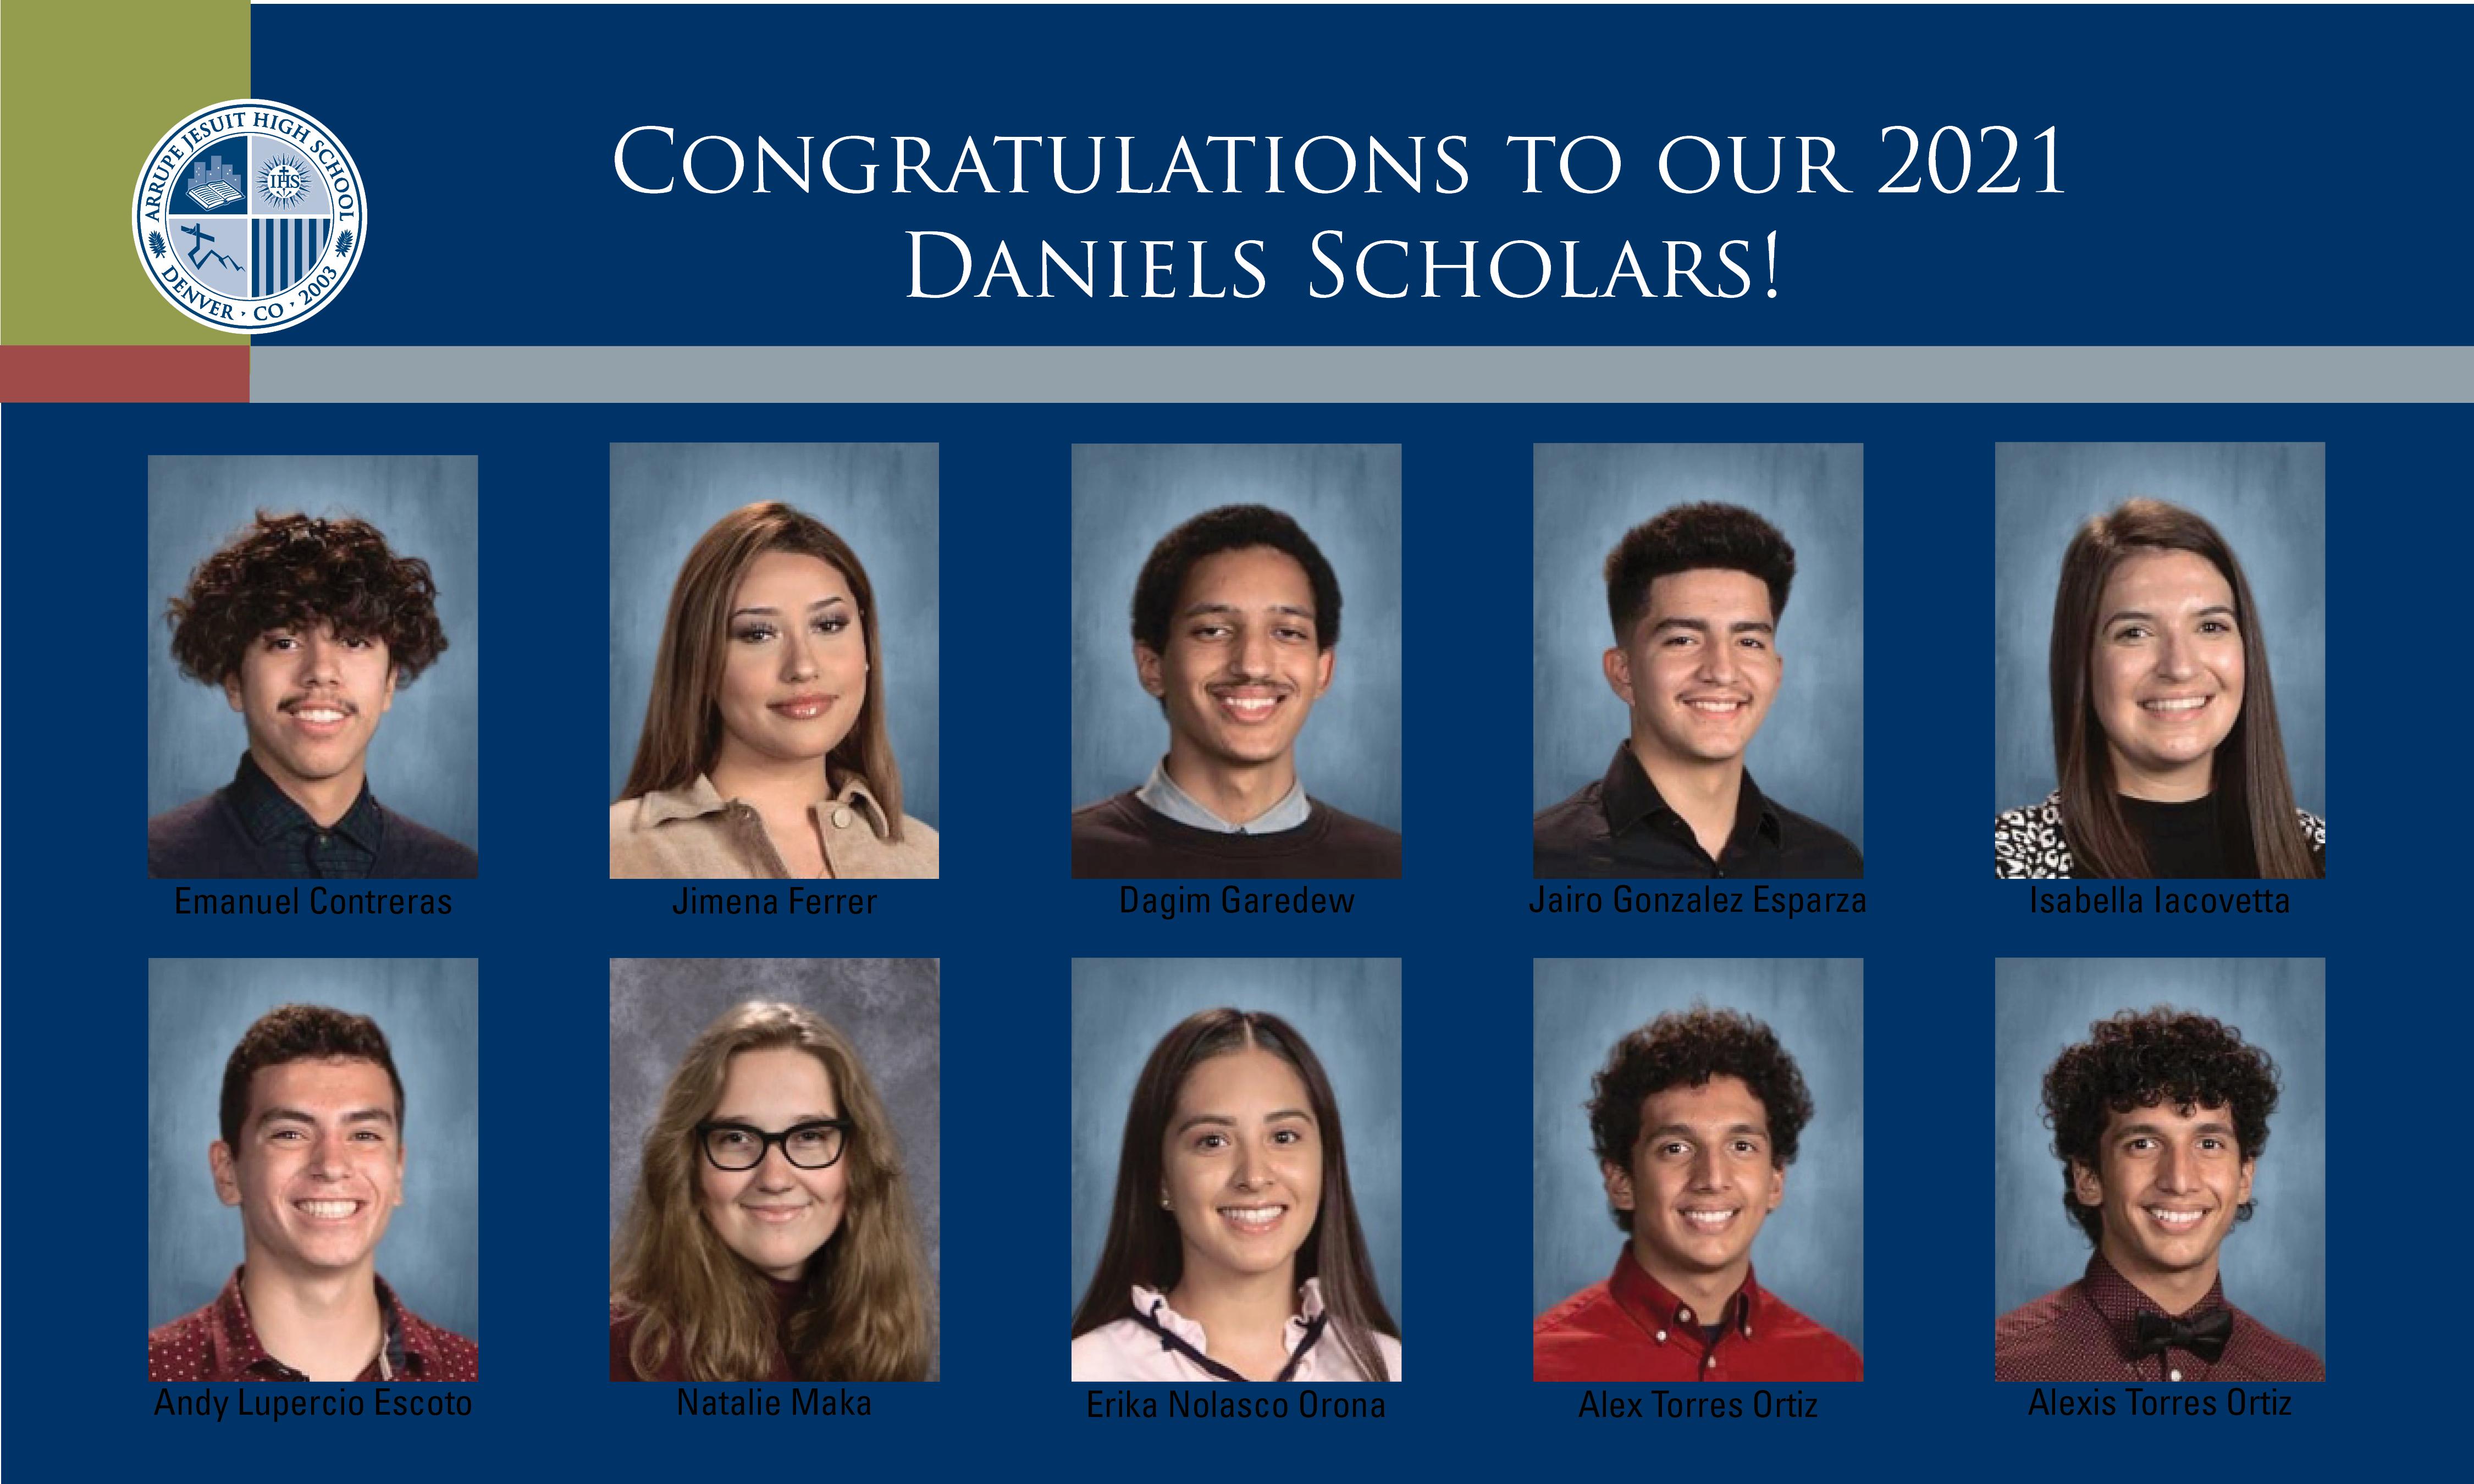 Daniels Fund announces 2021 Class of Daniels Scholars